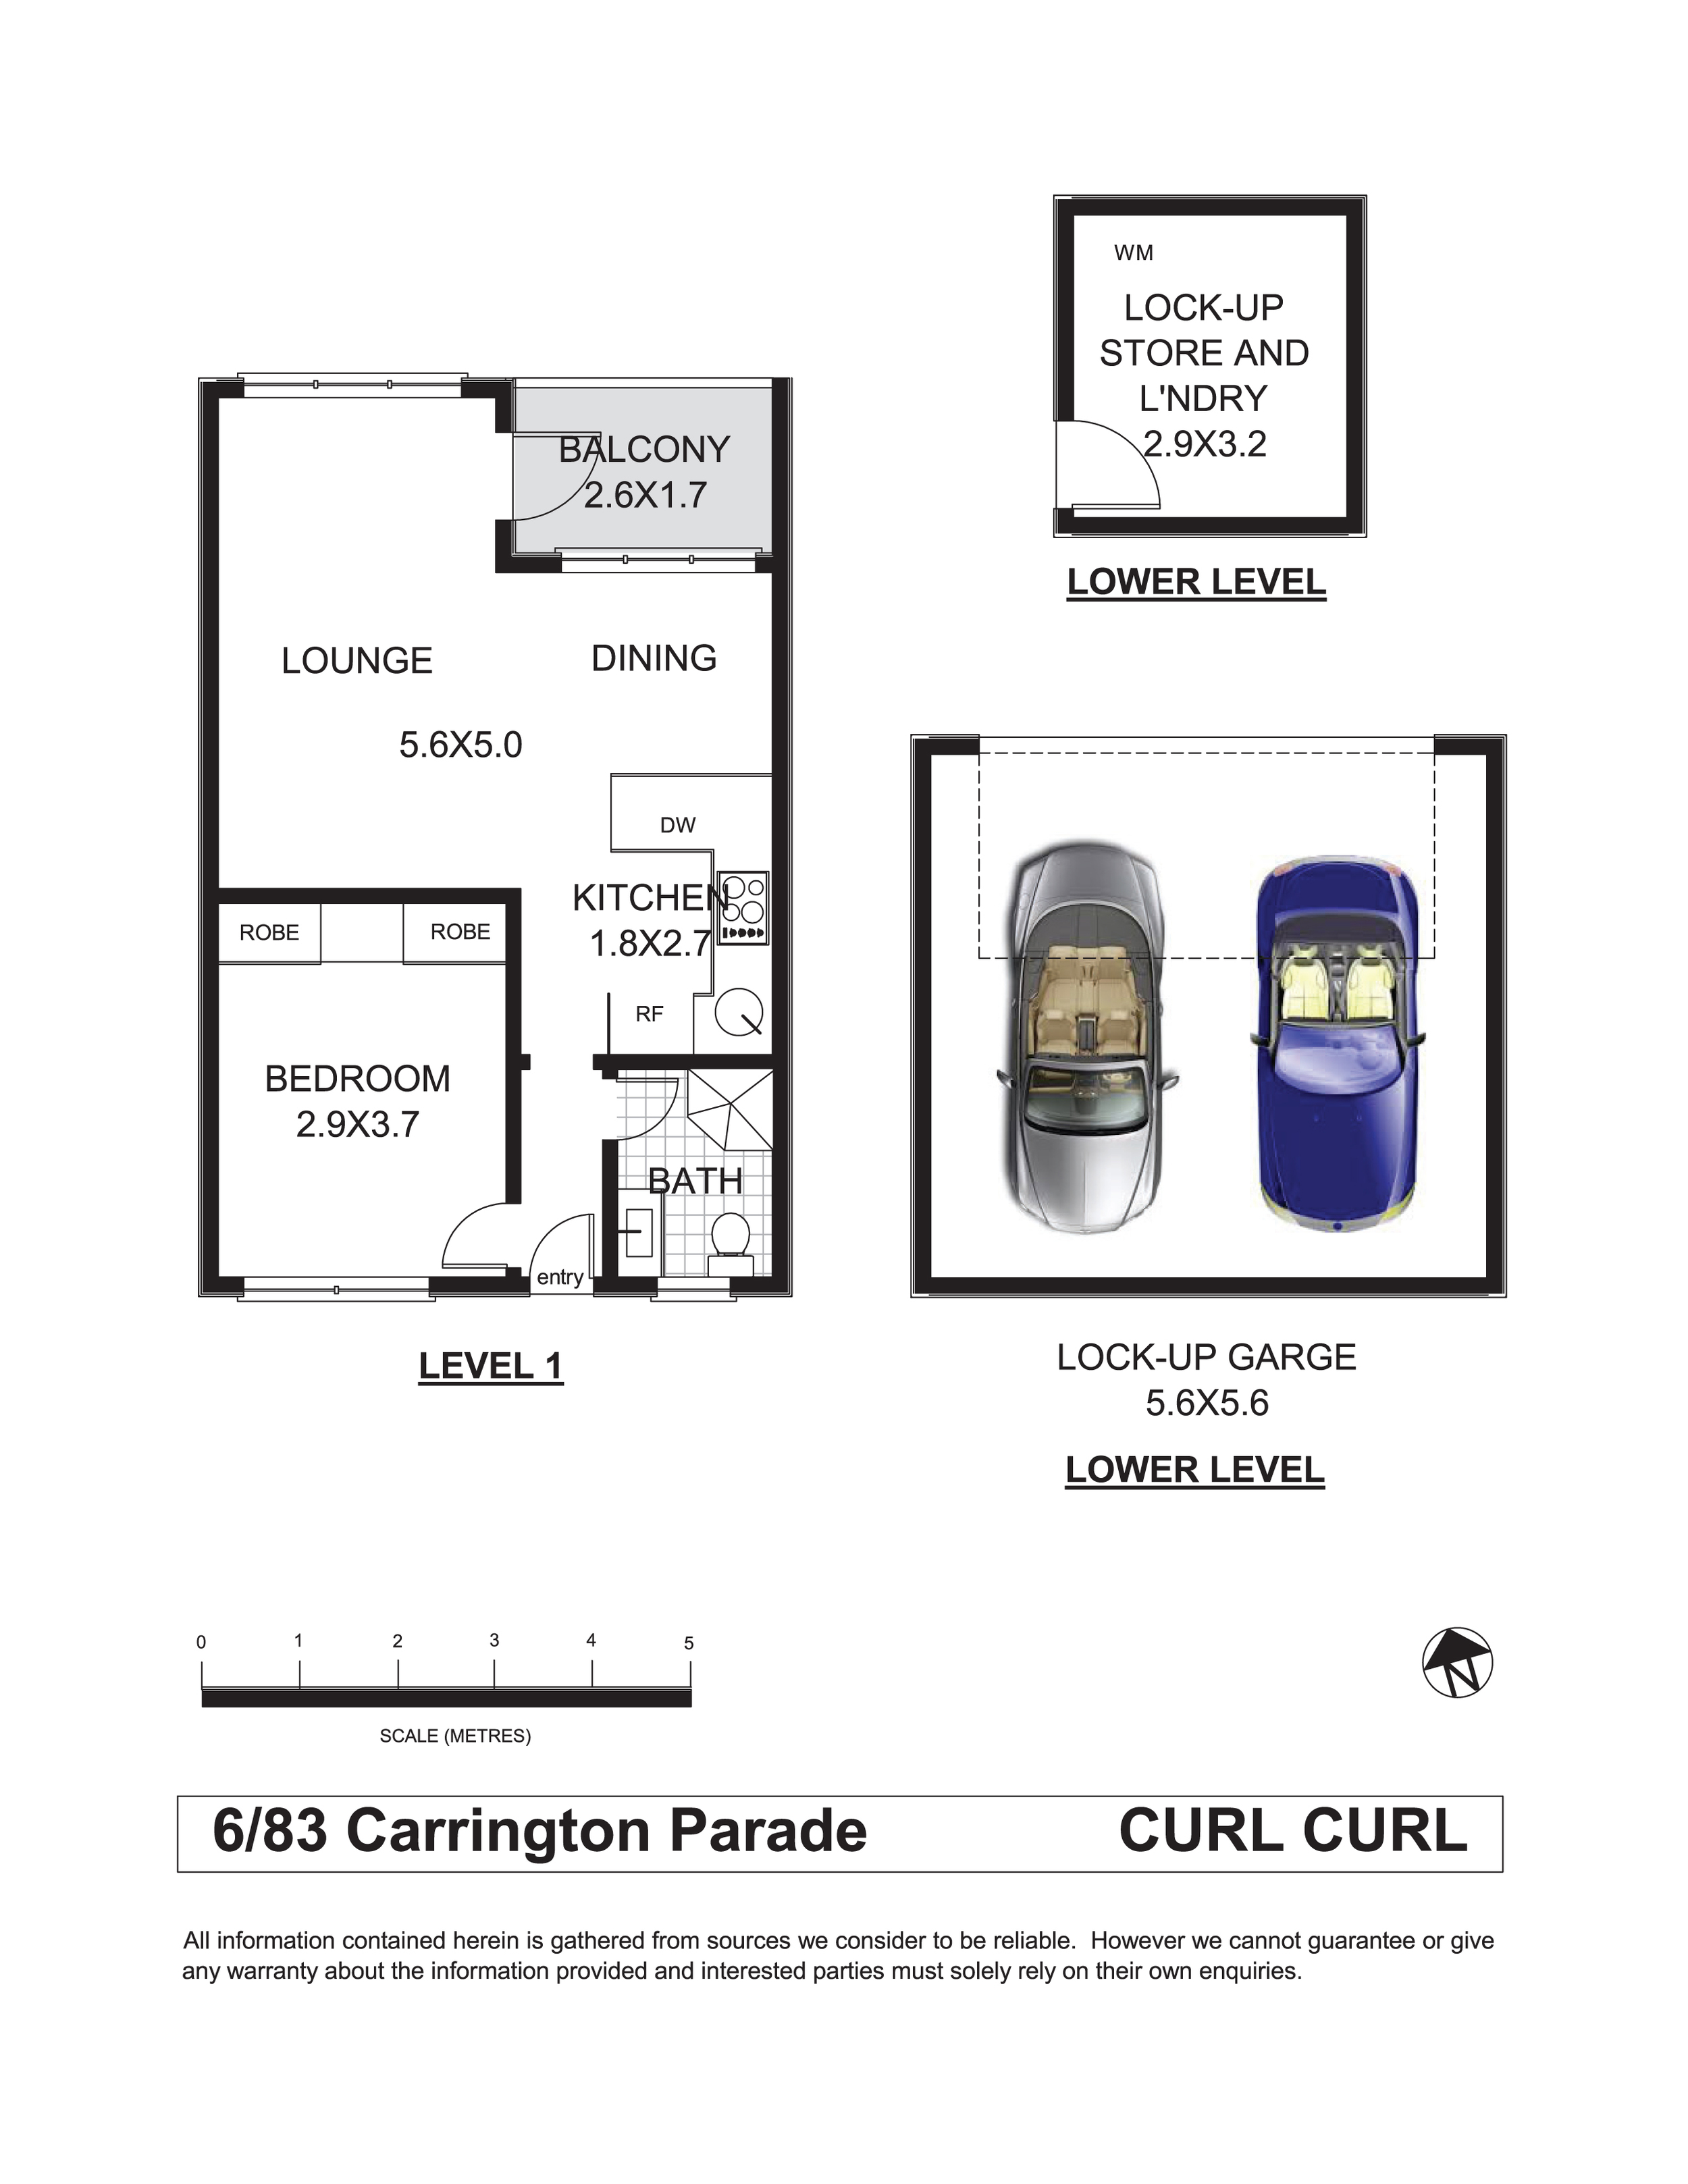 6@83 Carrington Parade Curl Curl.jpg